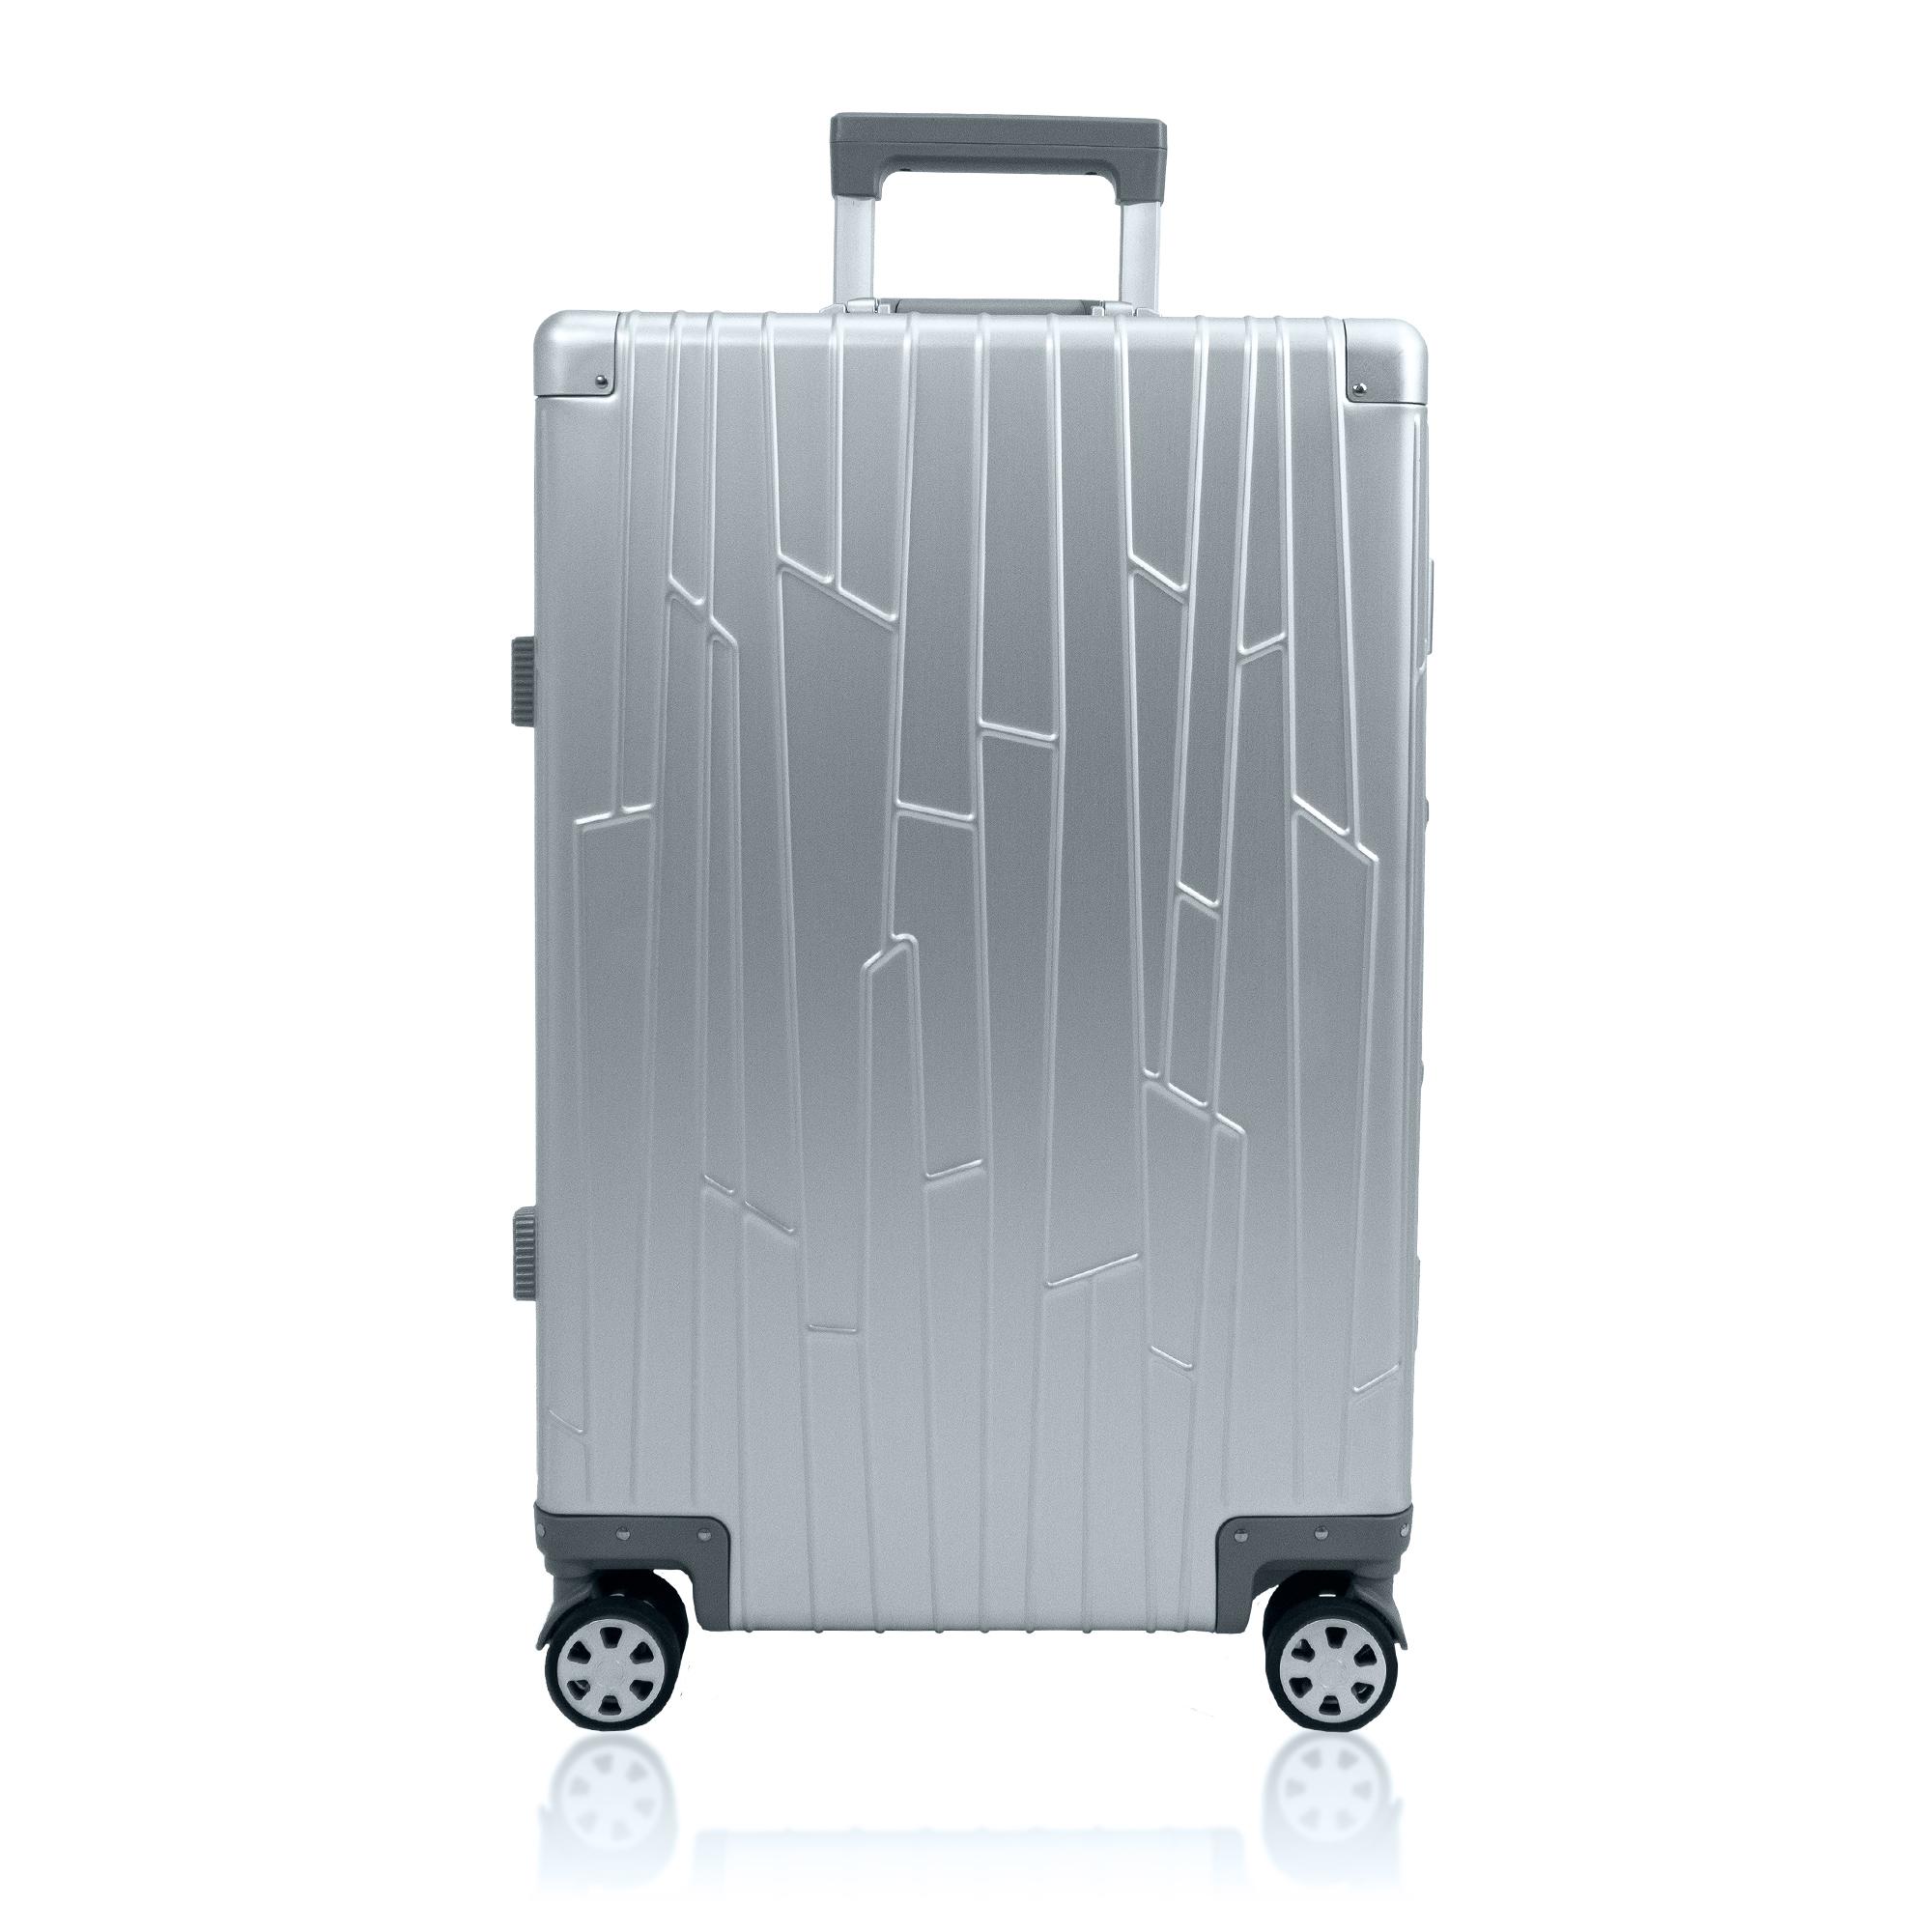 Check-in KOM-001E silver aluminium suitcase gundel checked luggage tsa-locks